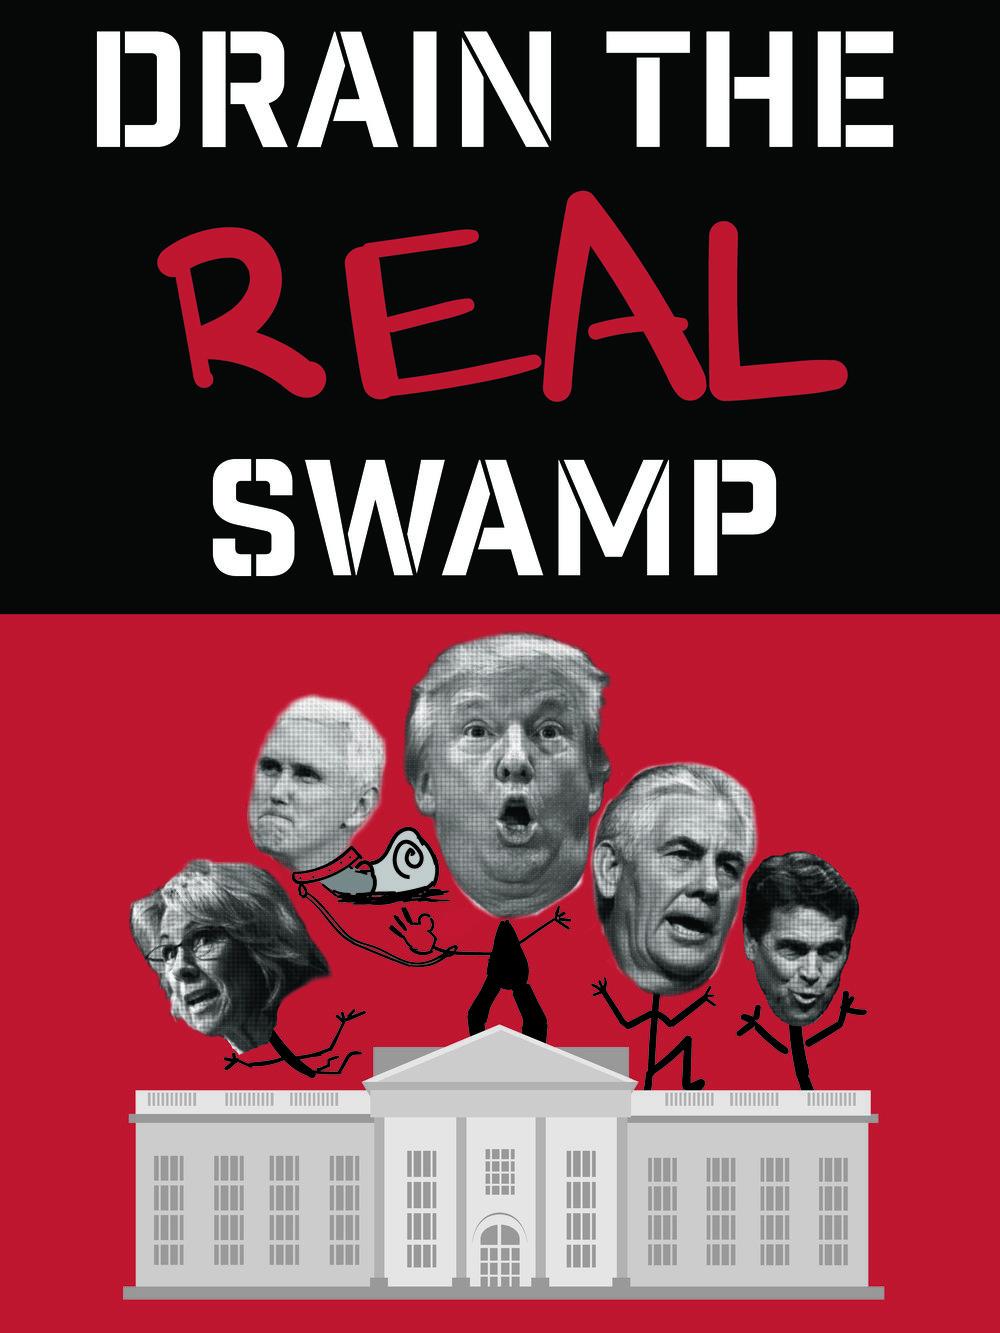 Turn Cheeto Benito's propaganda back on itself and   Drain the Real Swamp!